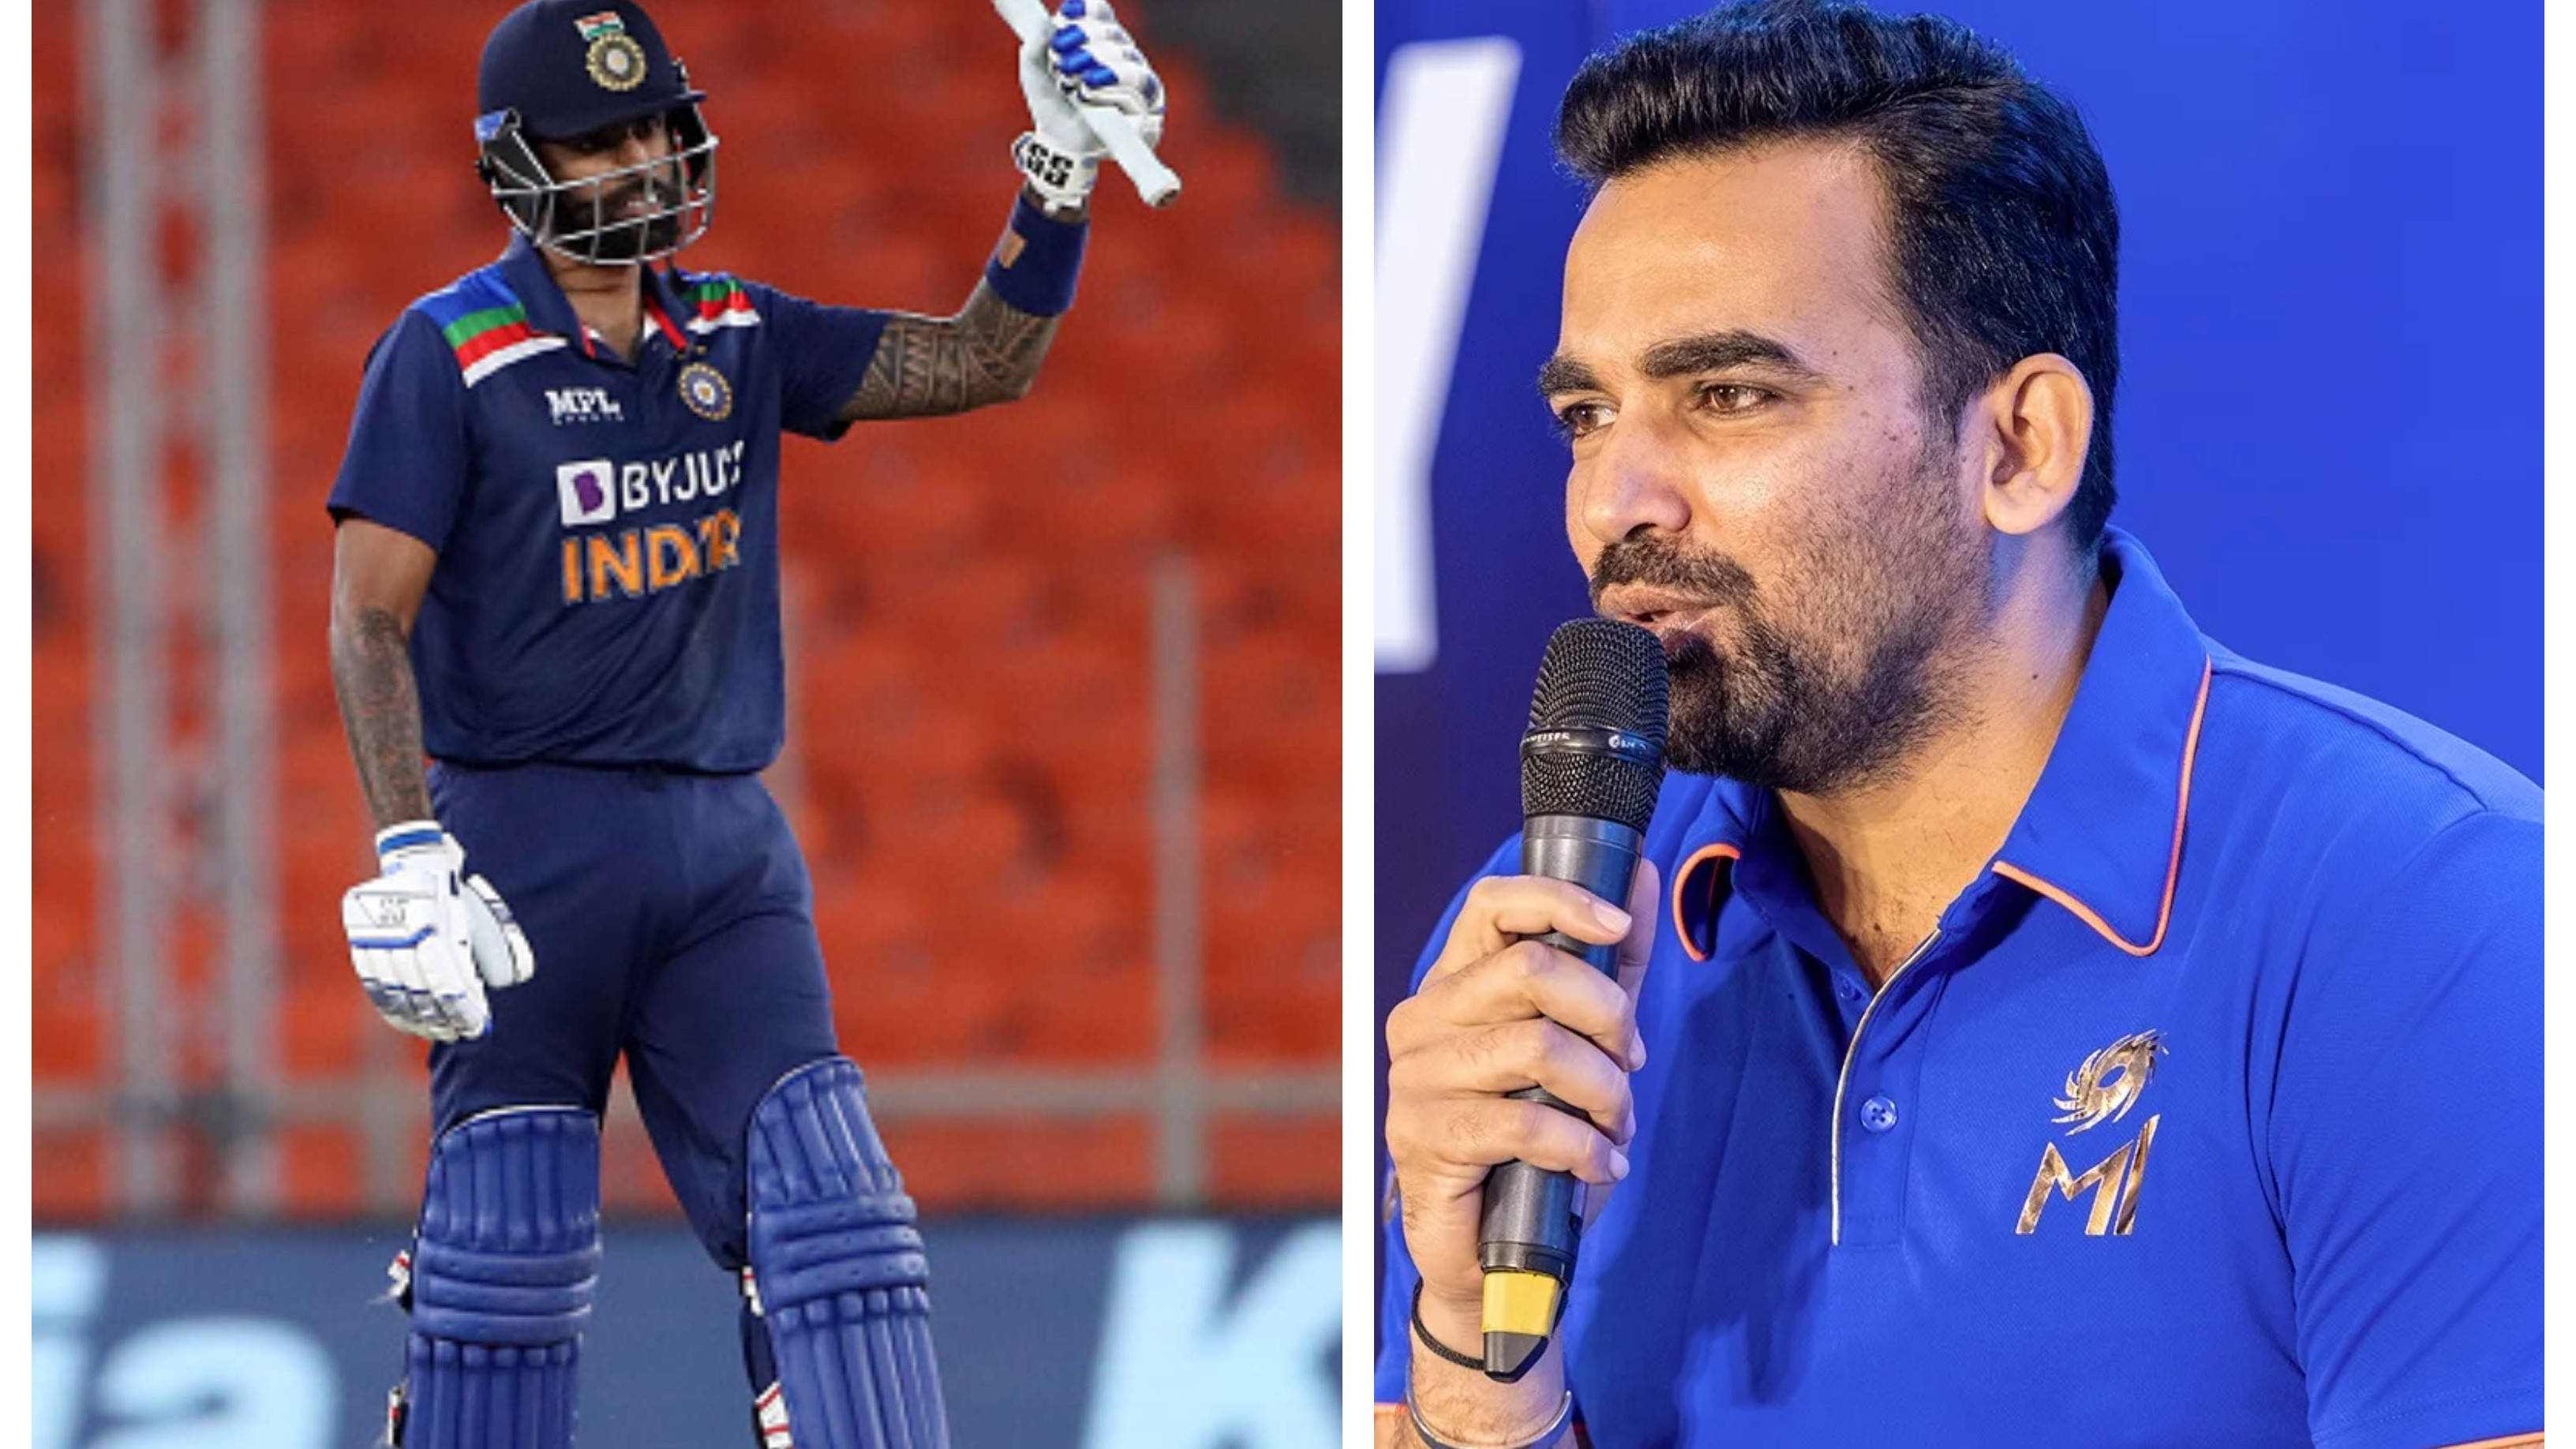 IPL 2021: Zaheer Khan lauds Suryakumar Yadav for managing himself well before India call-up